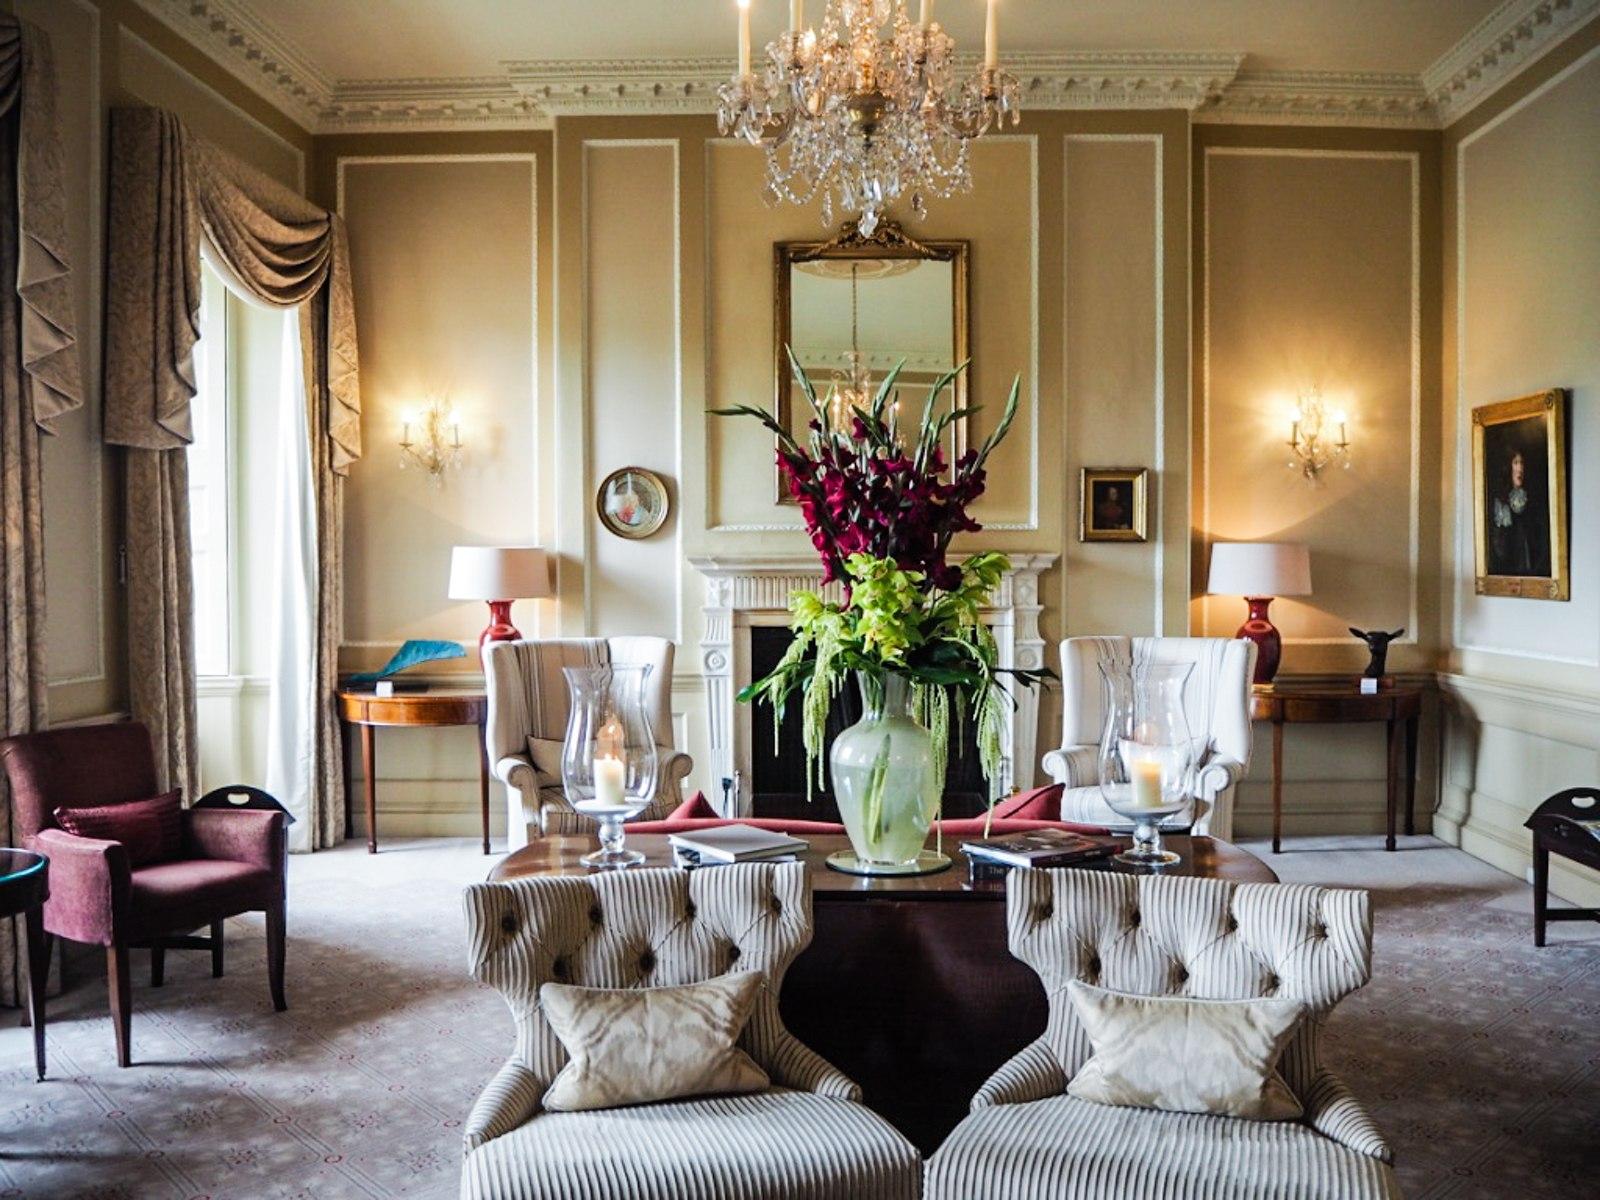 The Royal Crescent Spa & Hotel | Luxury 5 Star Hotel in Bath, UK